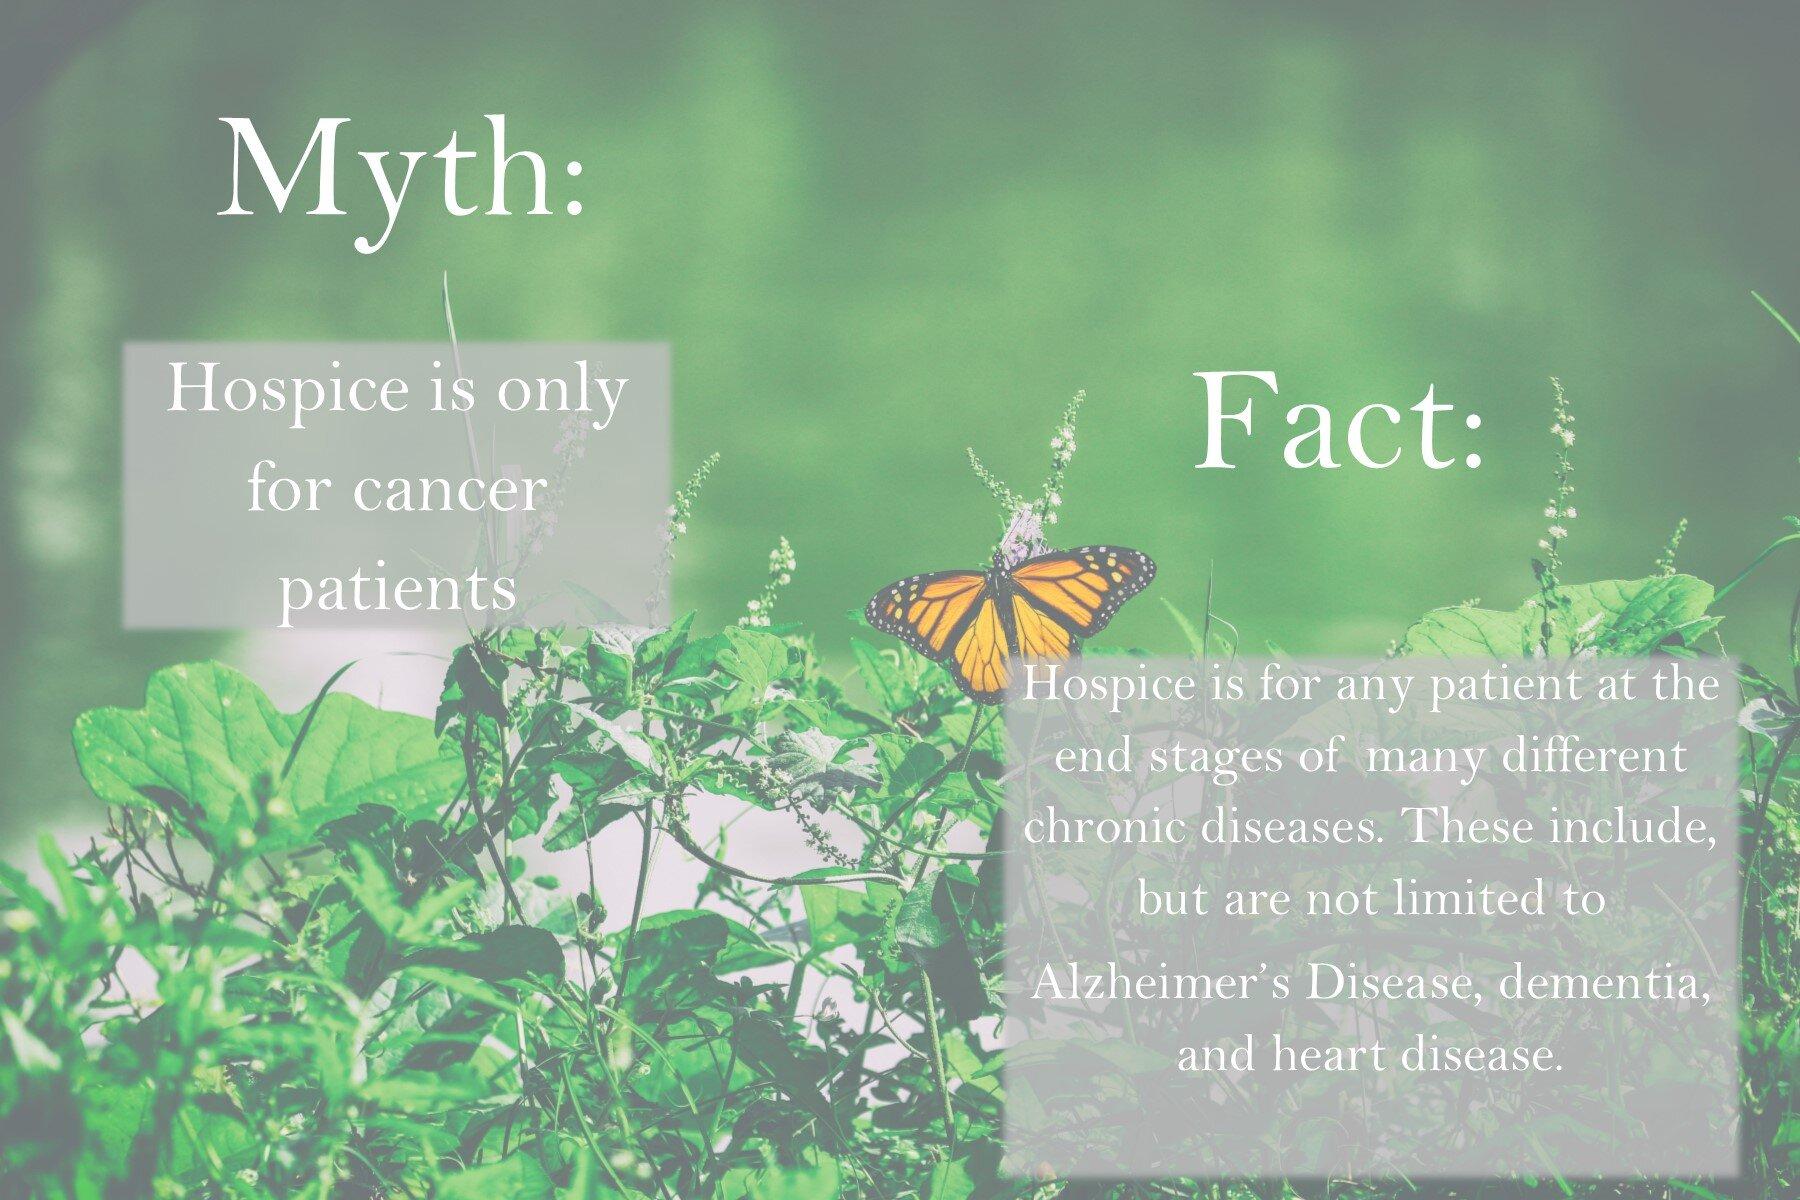 Mythvsfact1.jpg